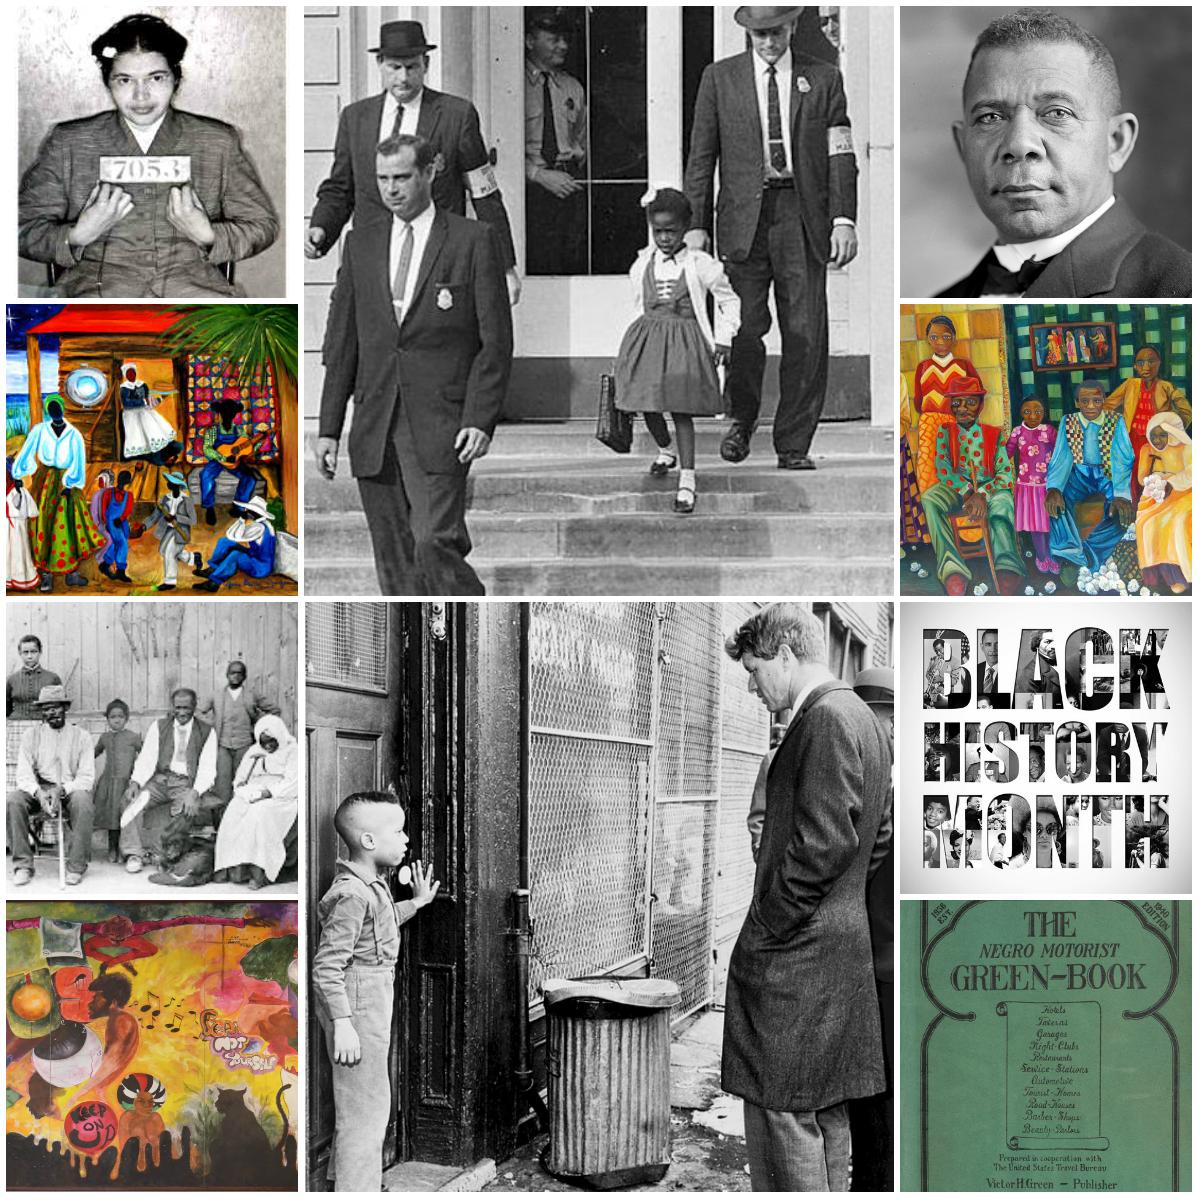 Motivation Mondays: Black History Month